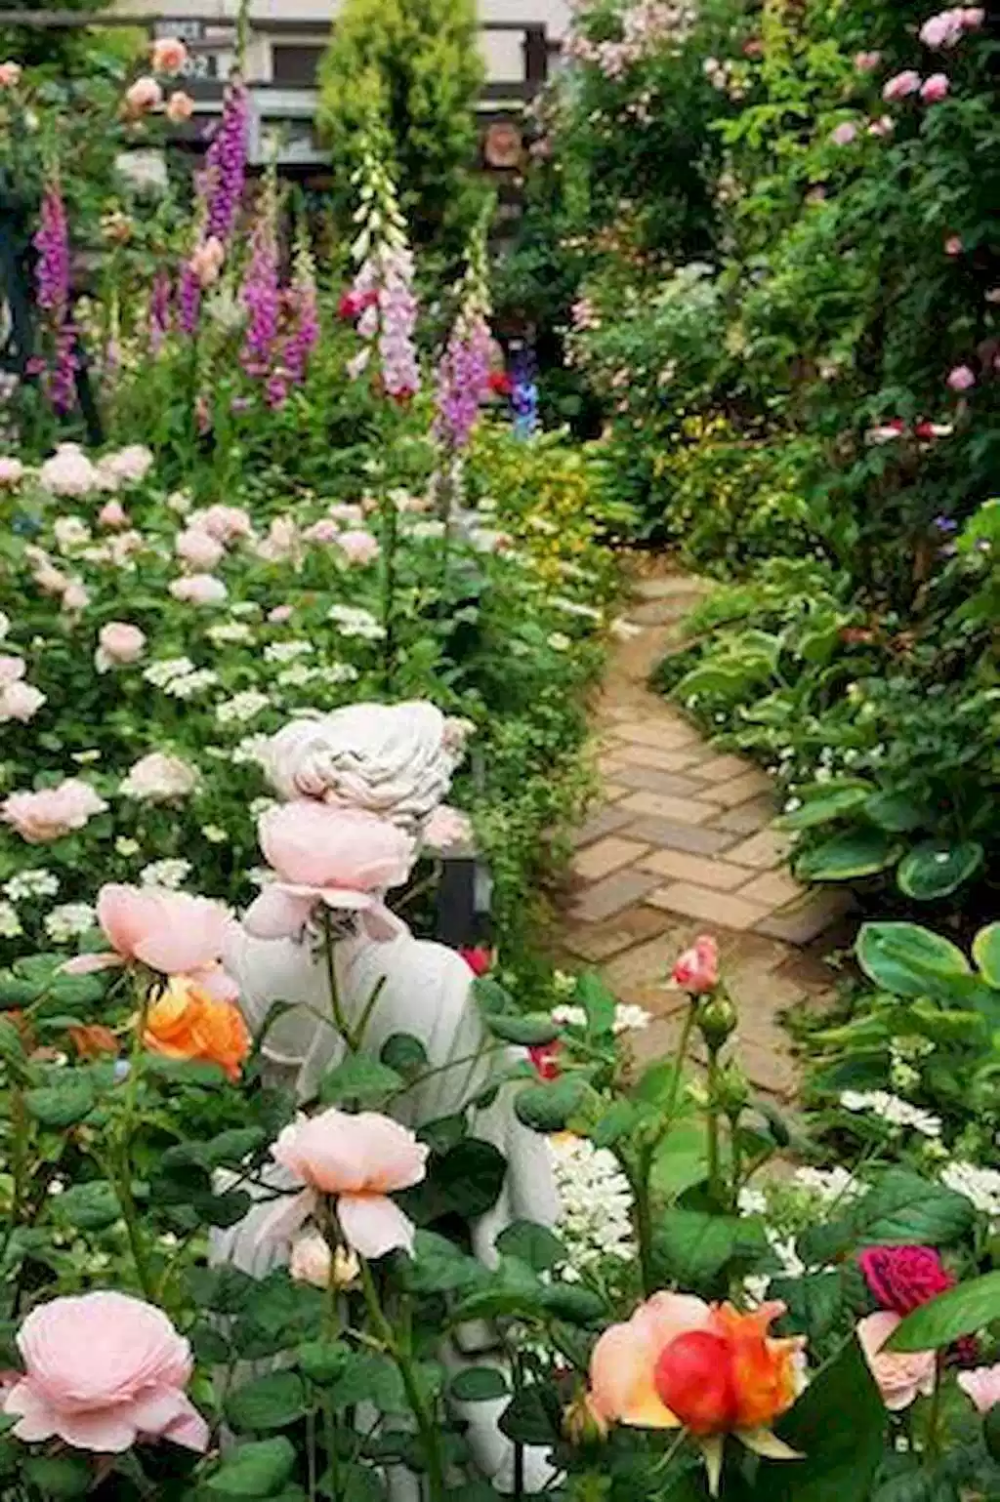 12 Stunning Cottage Garden Ideas For Front Yard Inspiration Decoradeas Small Flower Gardens Front Yard Garden Cottage Garden Design